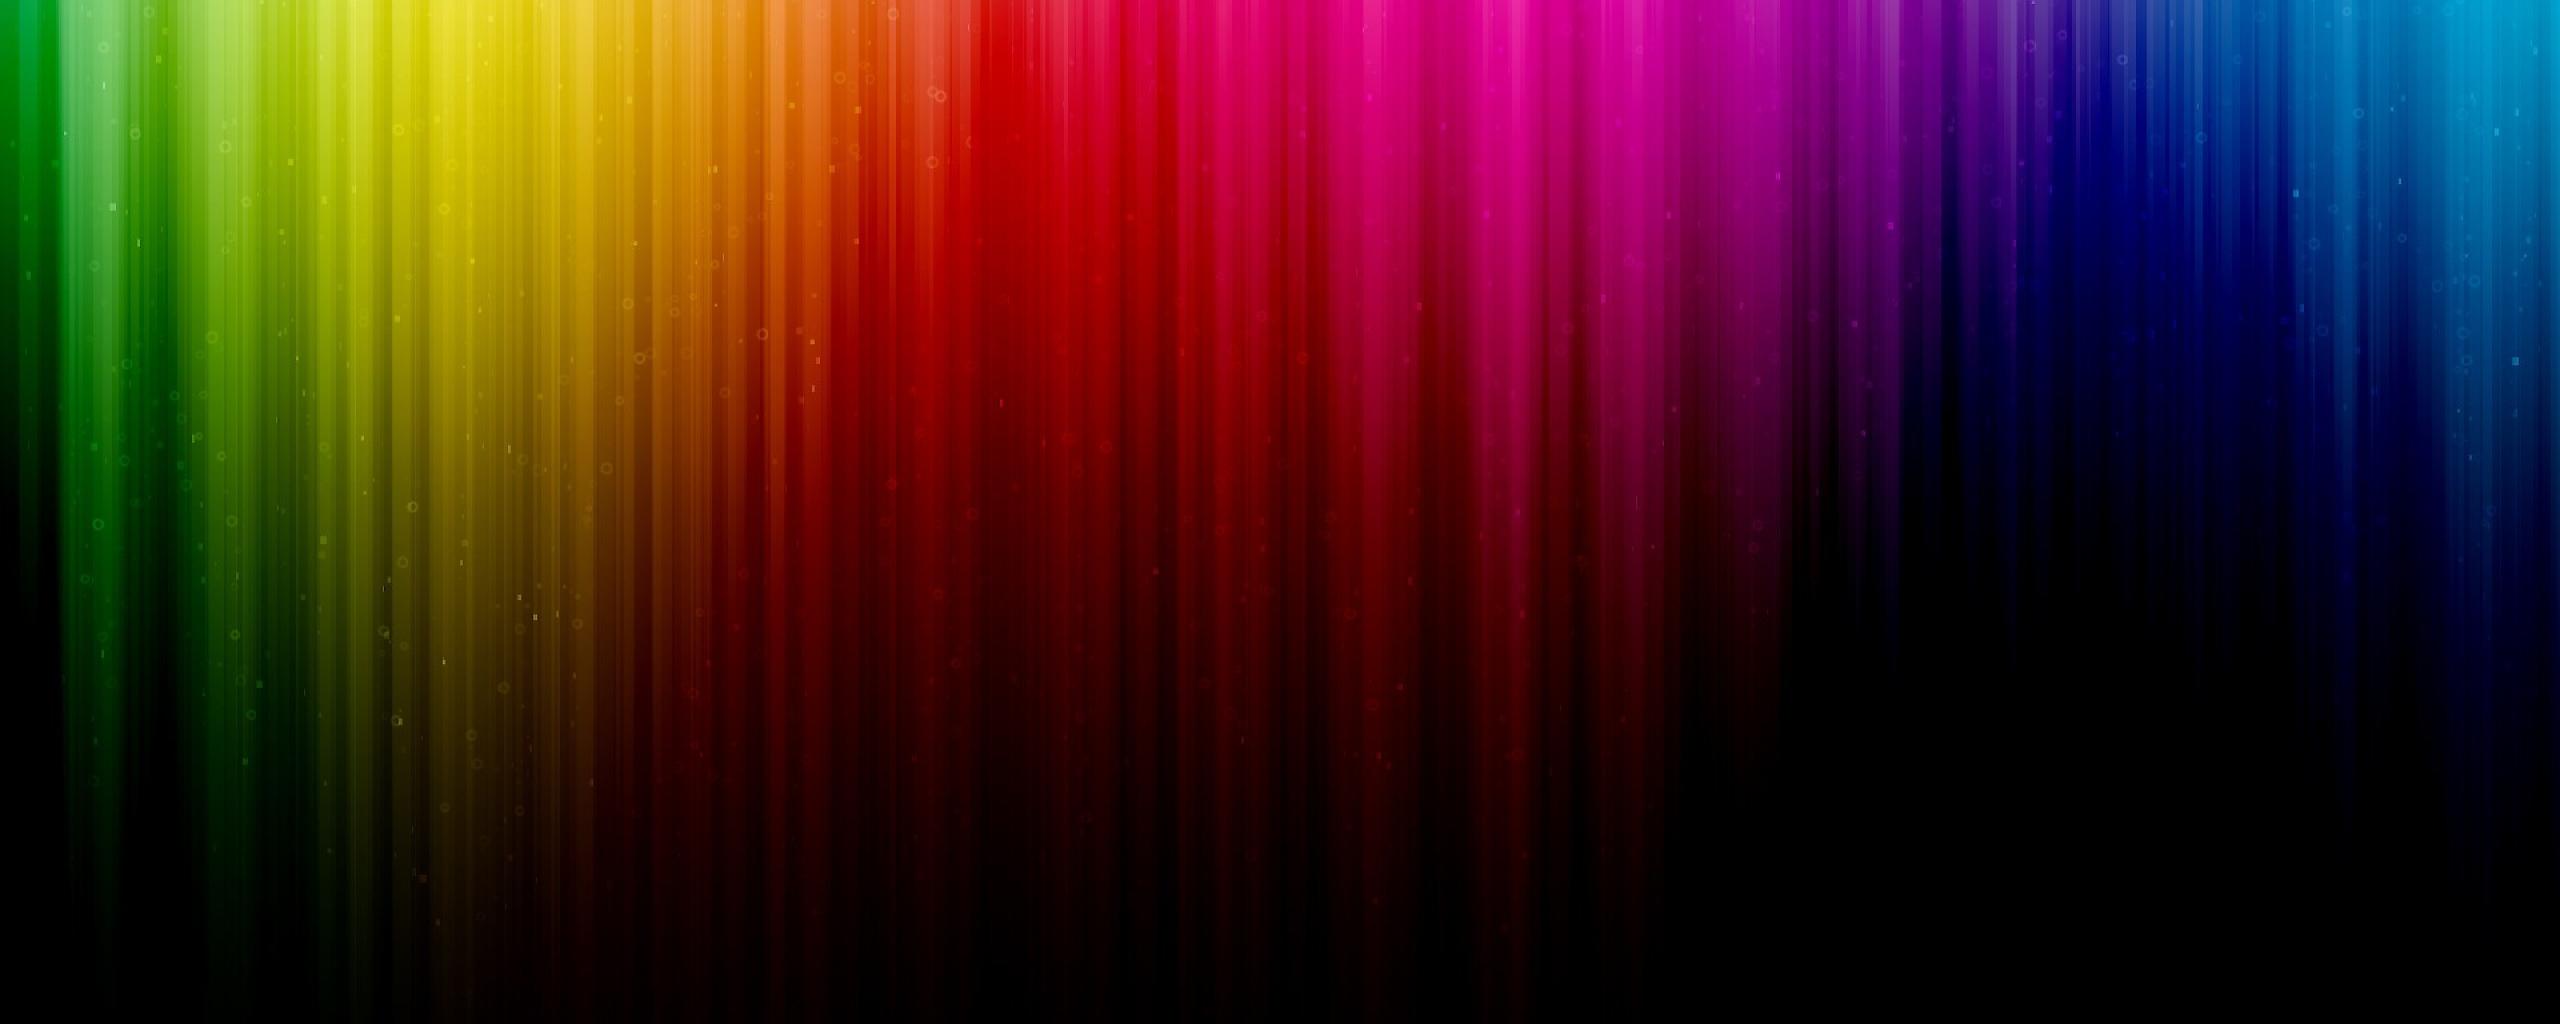 Shadow Stripes Vertical Dual Monitor Resolution HD Background 2560x1024